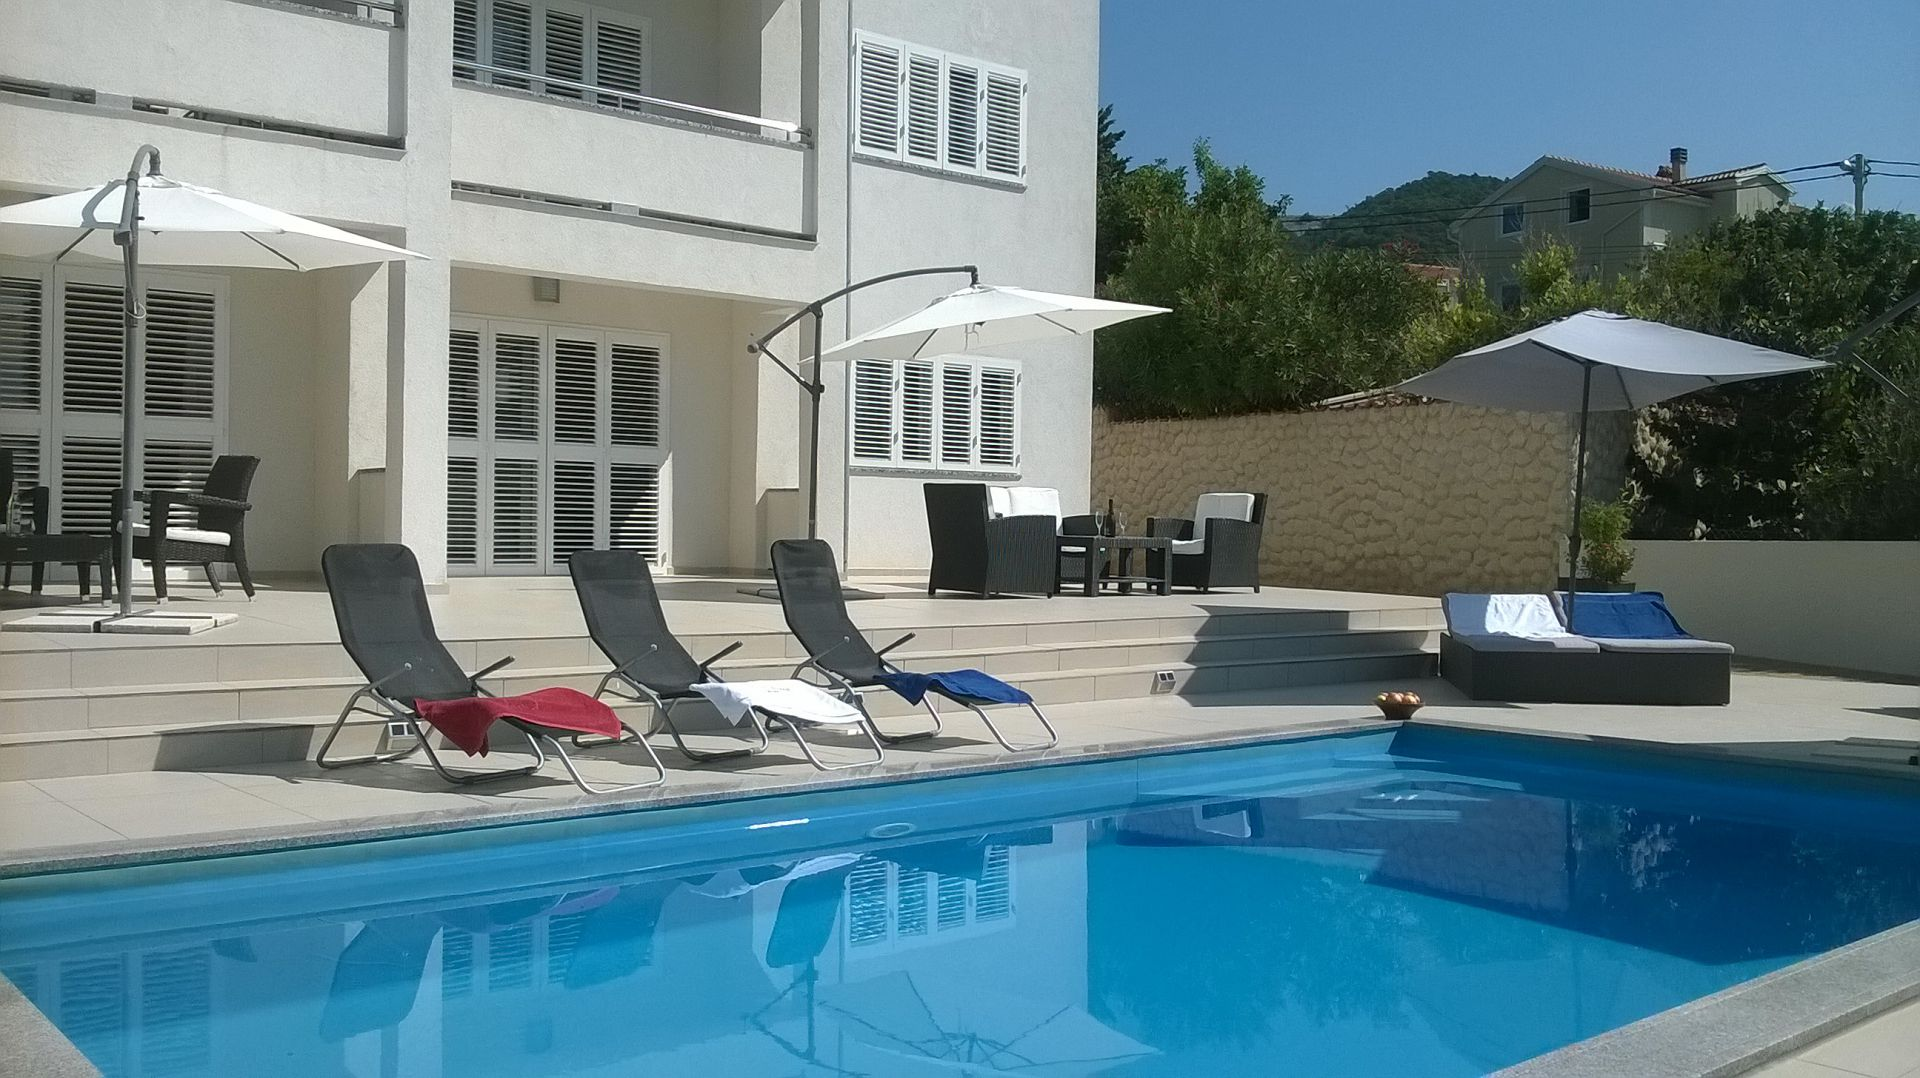 Appartementen Apartment MK A5 Banjol, Island Rab 50476, Banjol, Rab, Regio Primorje-Gorski Kotar